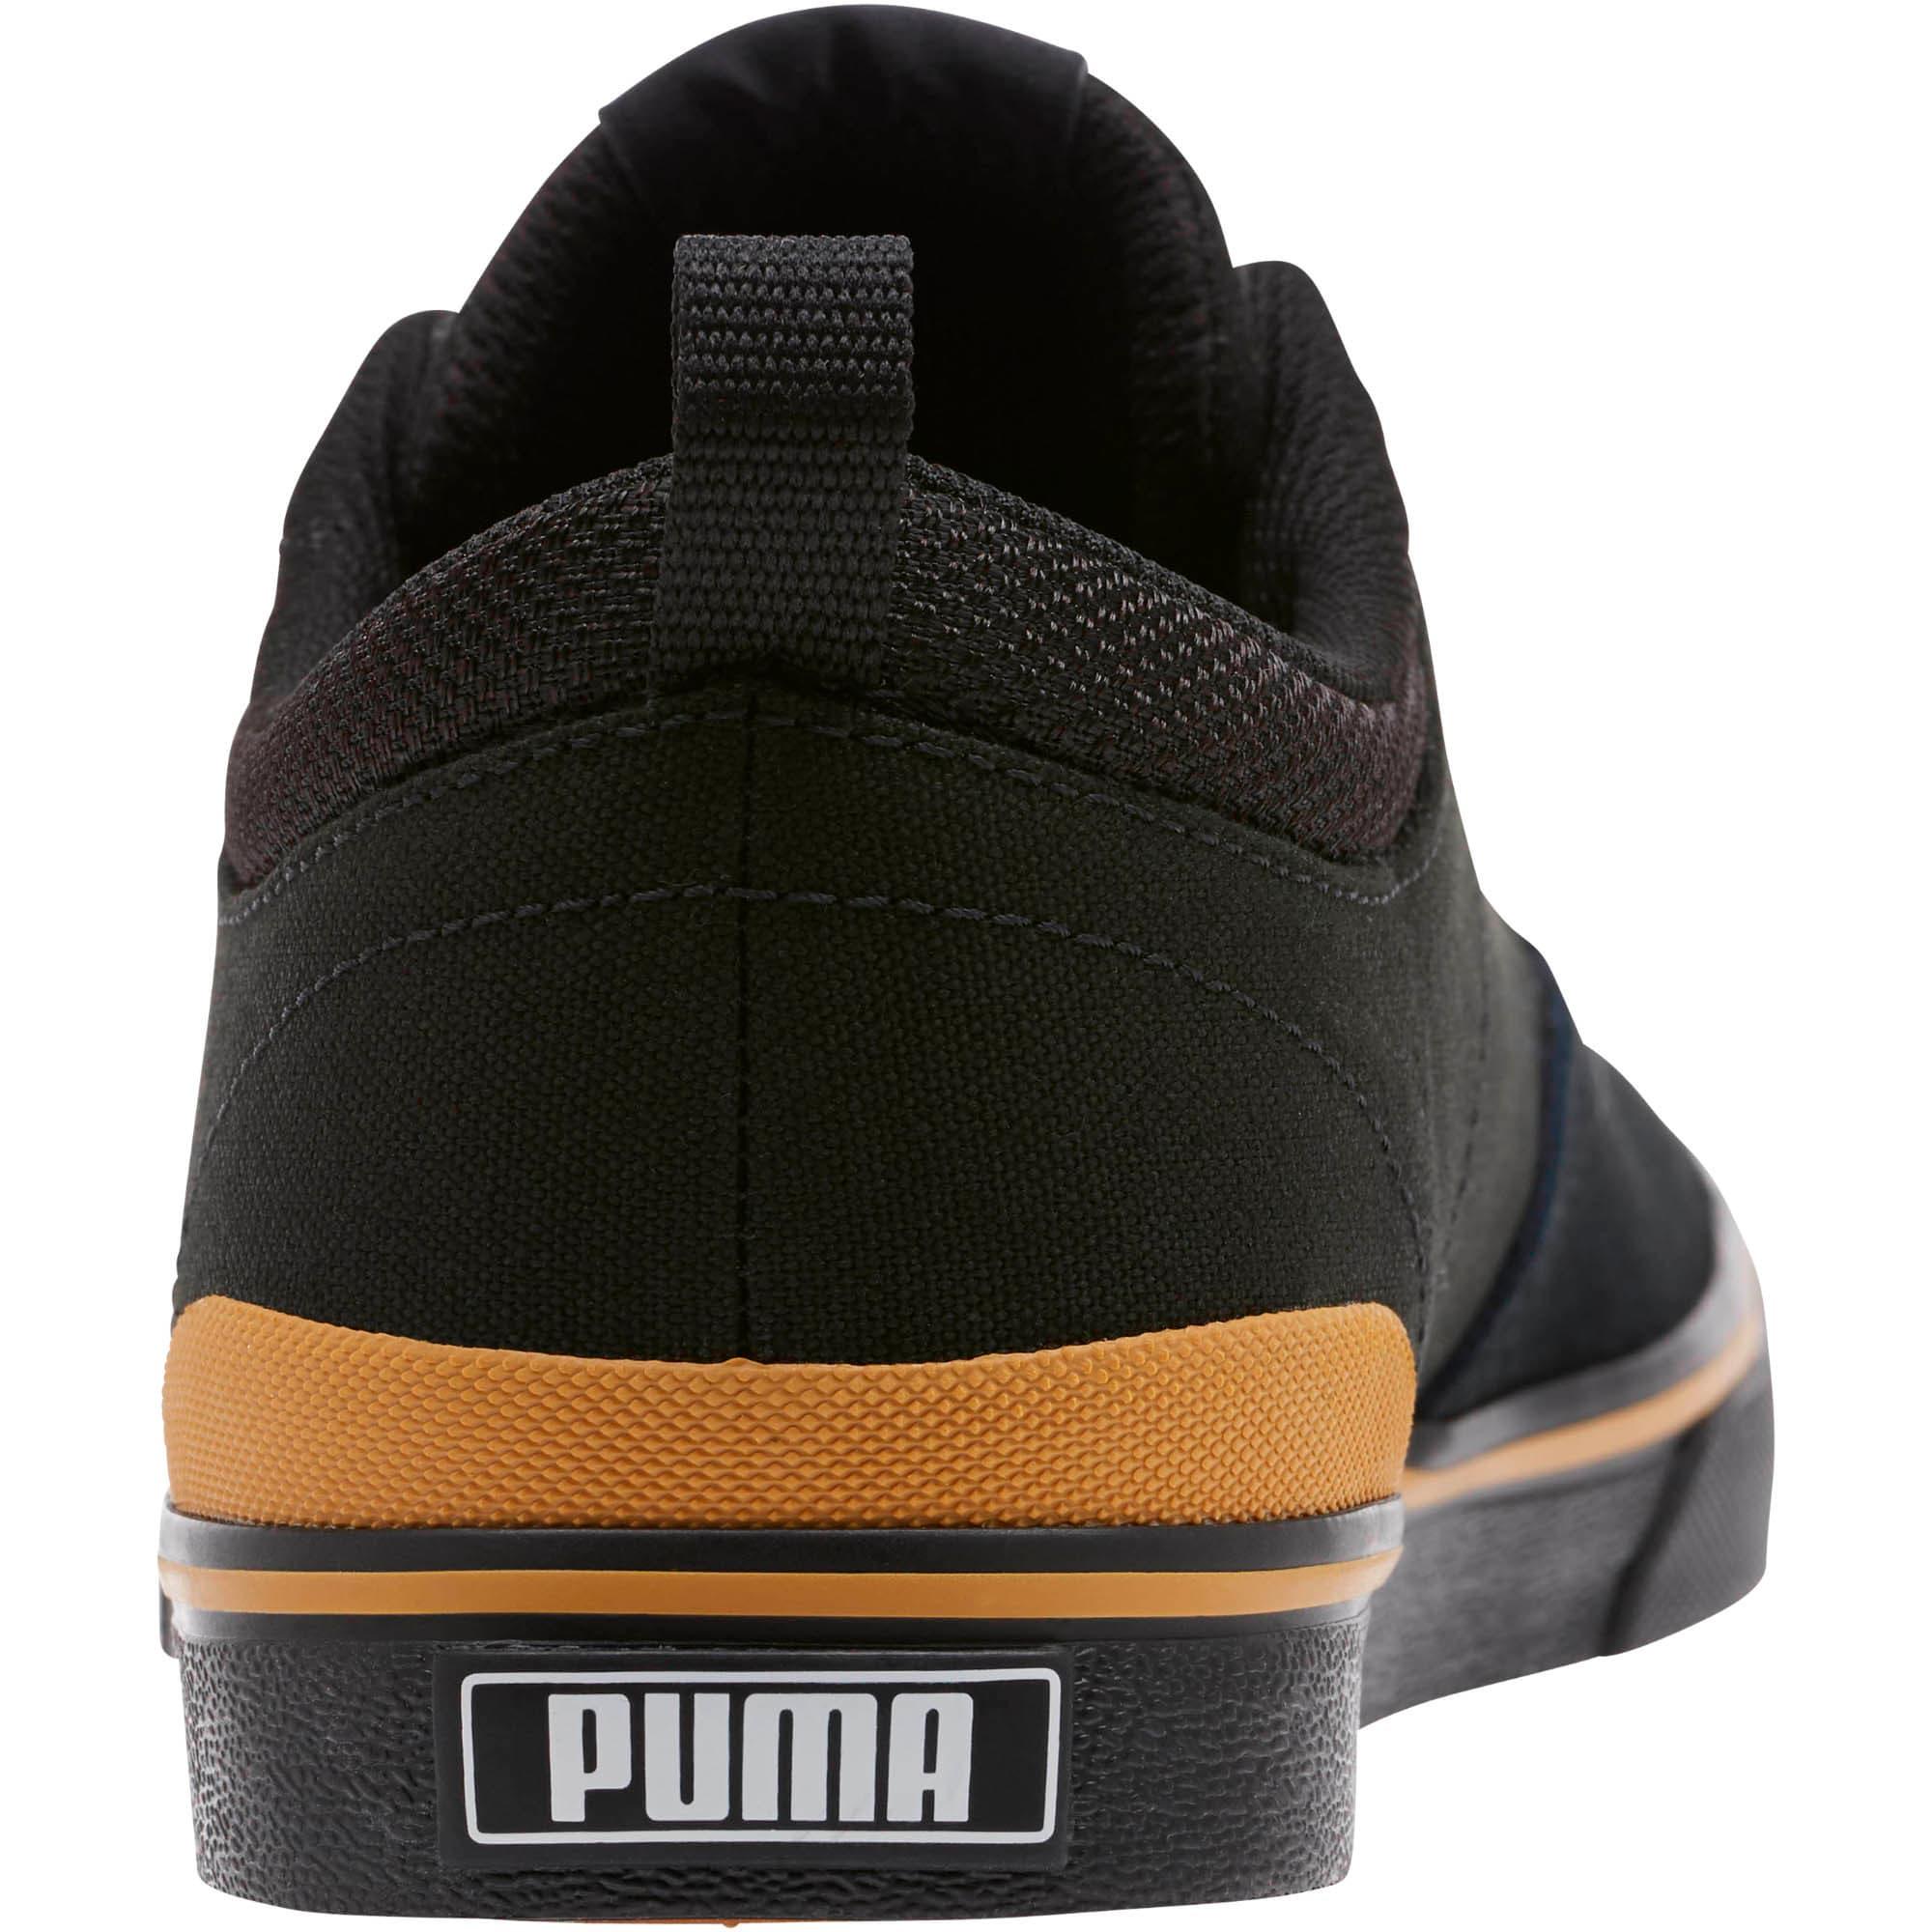 Thumbnail 4 of Puma Bridger Cat Men's Sneakers, Puma Black-Asphalt, medium